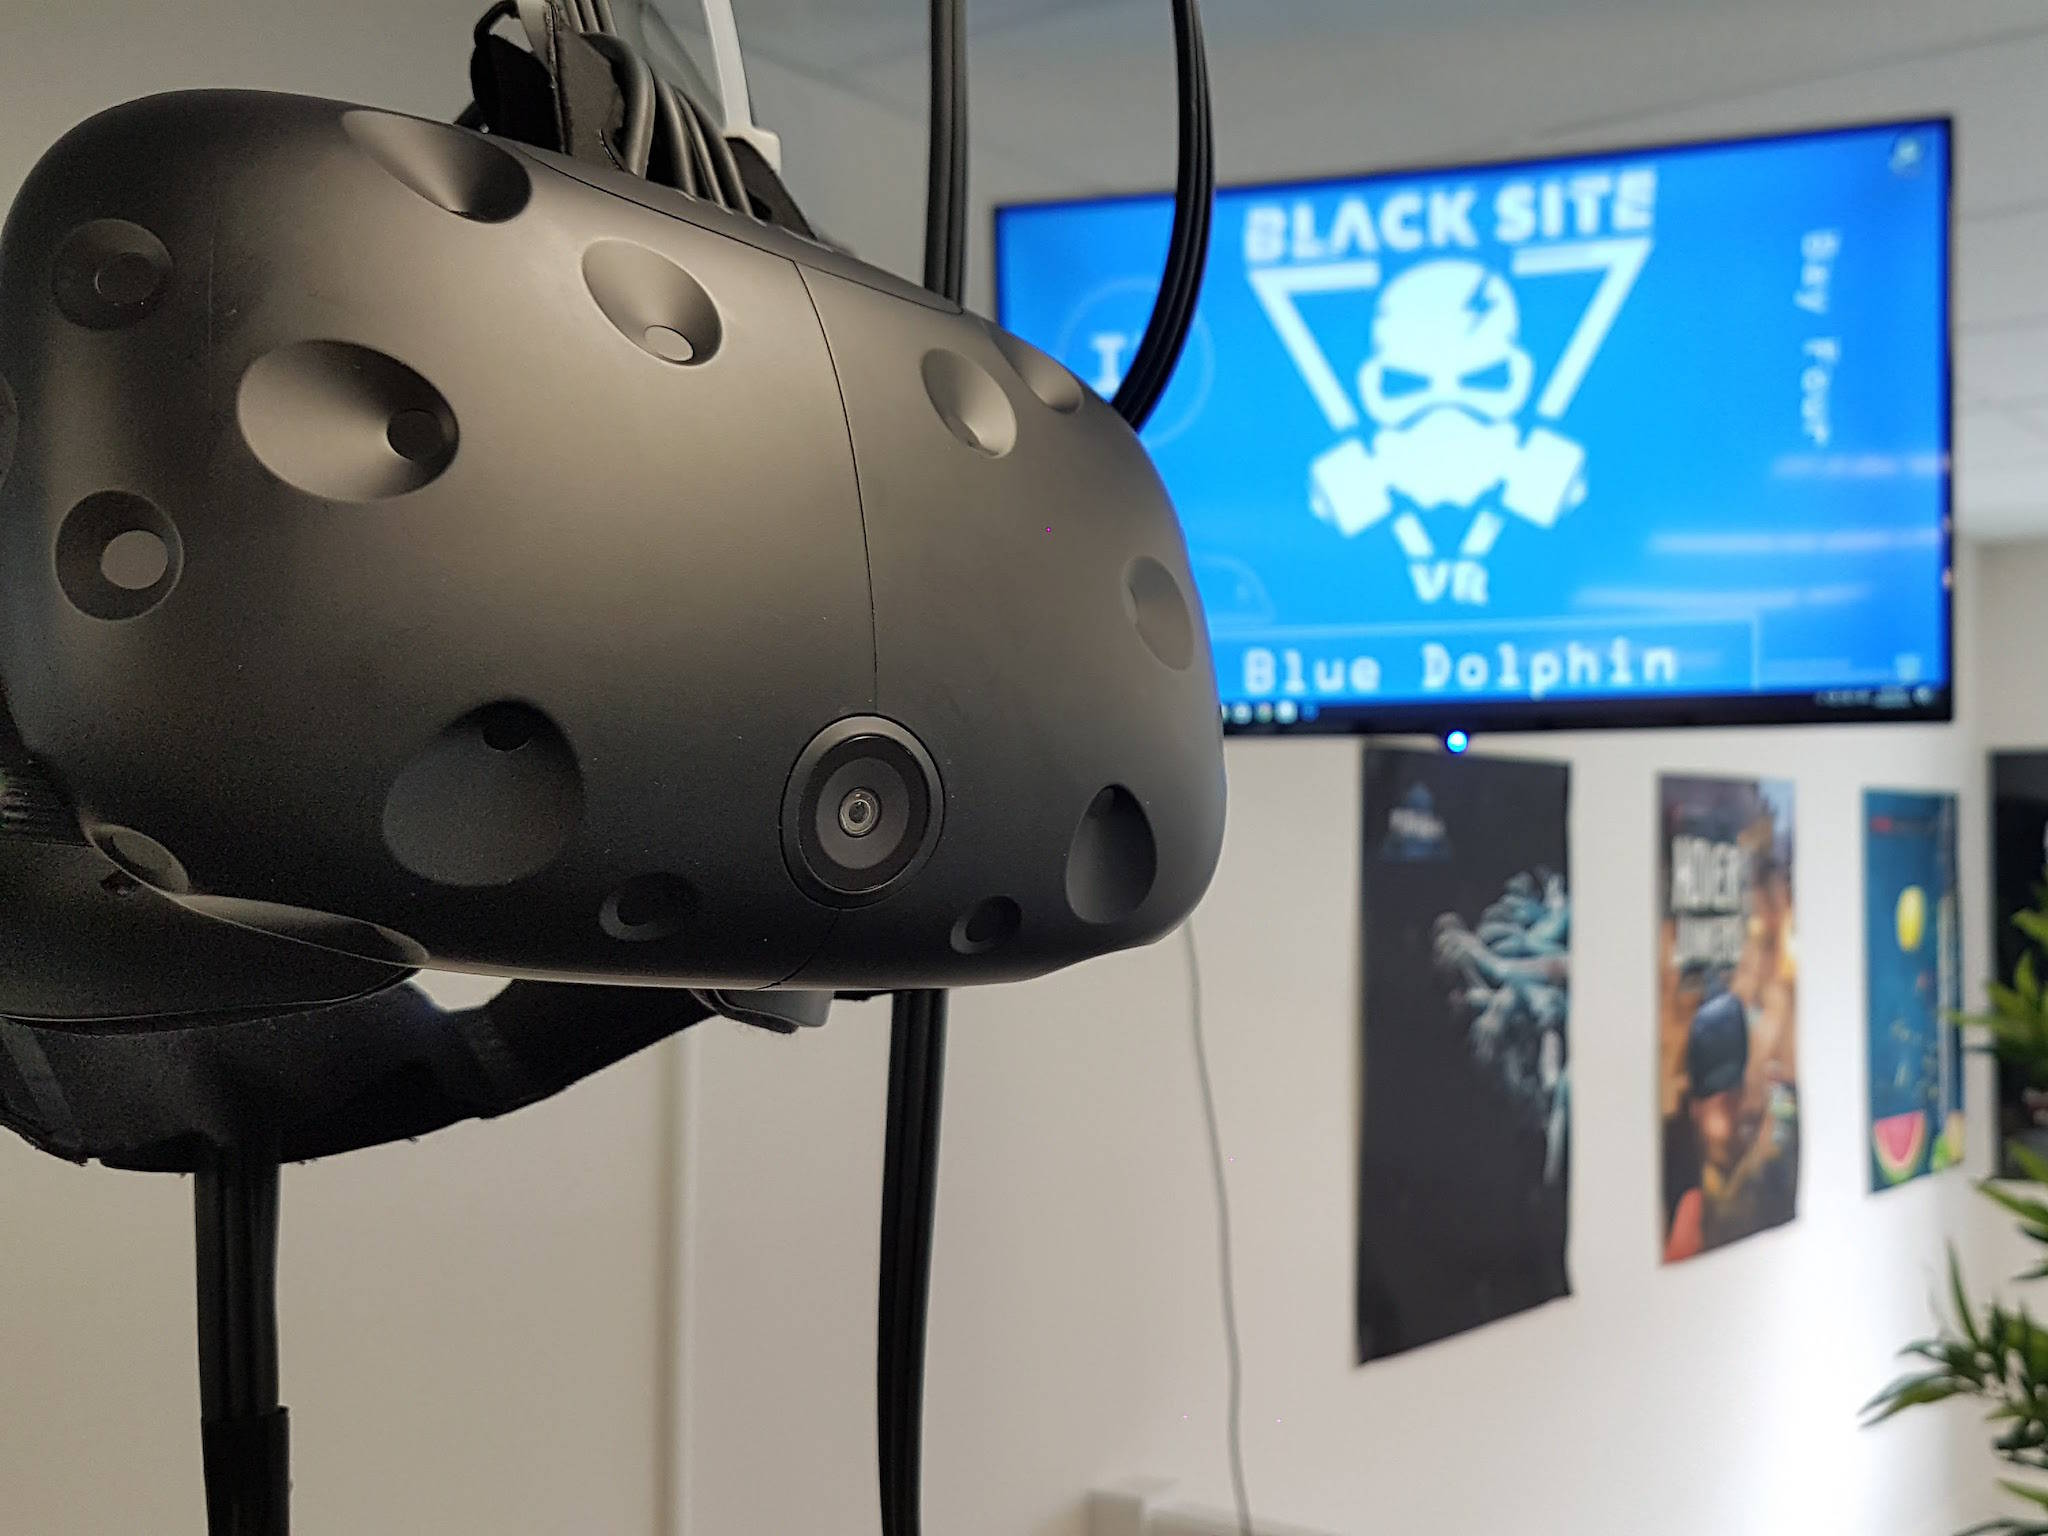 Black Site VR